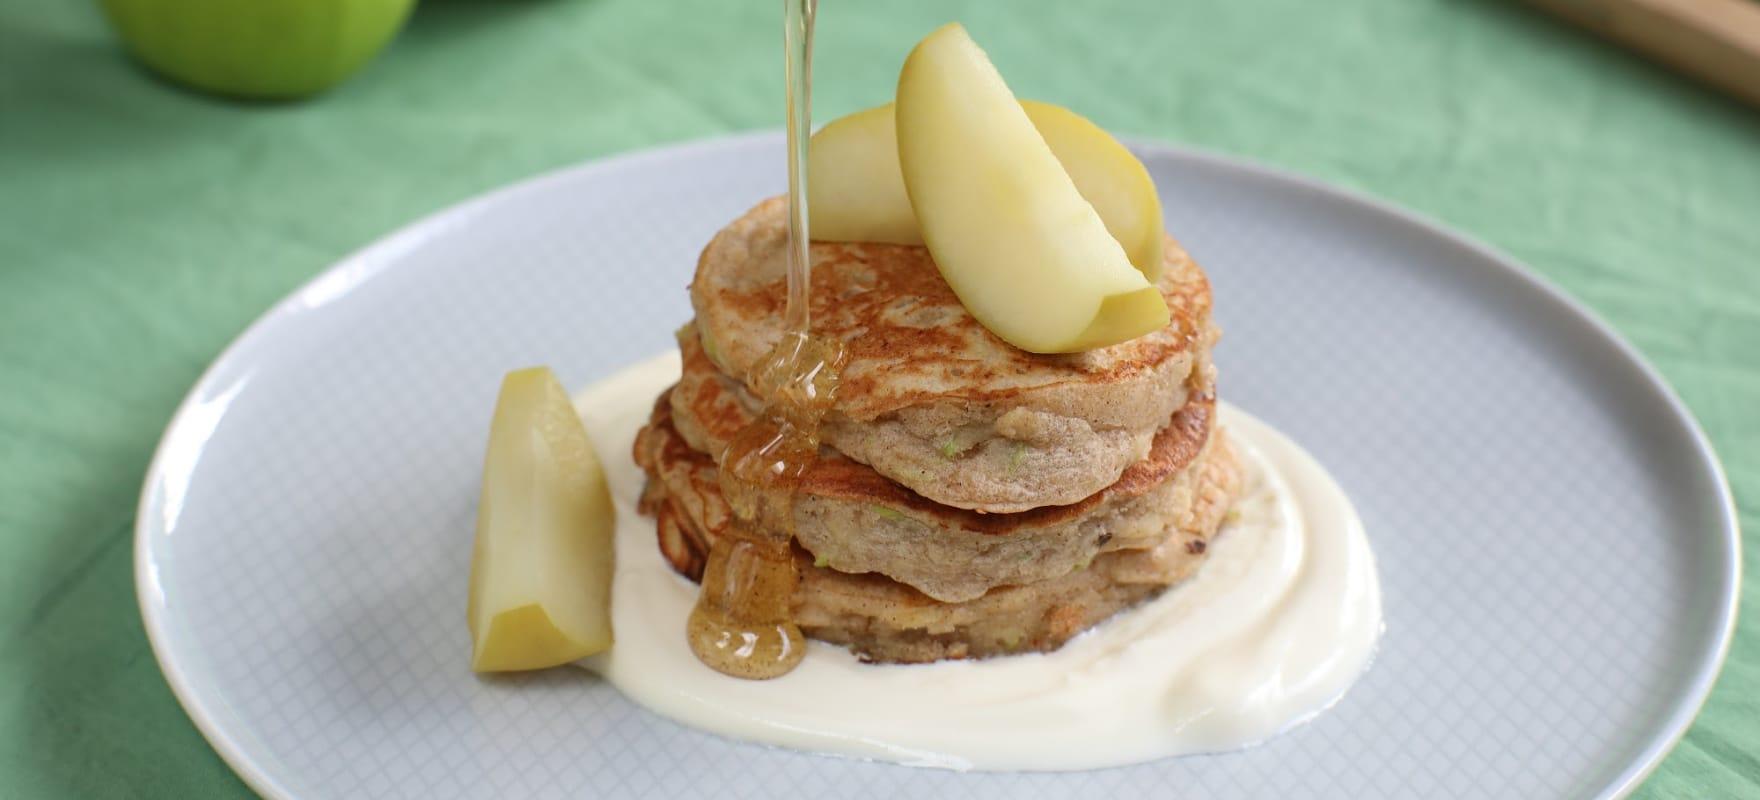 Ricotta, apple and cinnamon hotcakes image 1